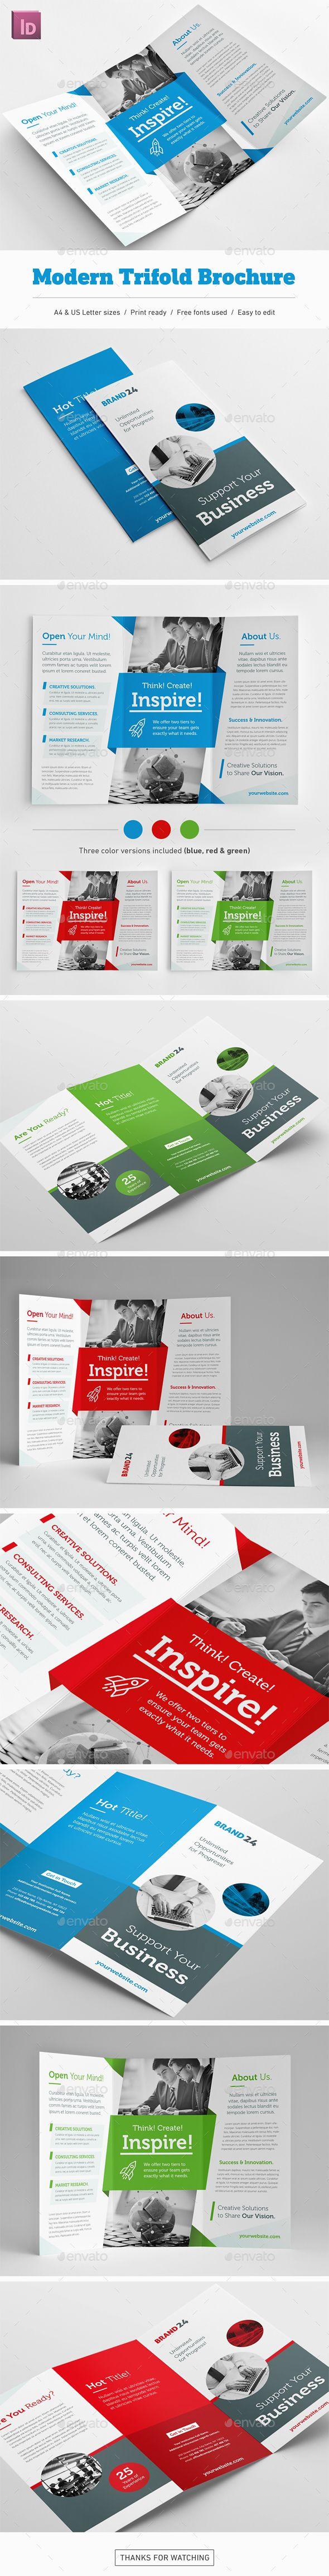 Modern #Trifold #Brochure - Corporate Brochures Download here: https://graphicriver.net/item/modern-trifold-brochure/19755609?ref=alena994